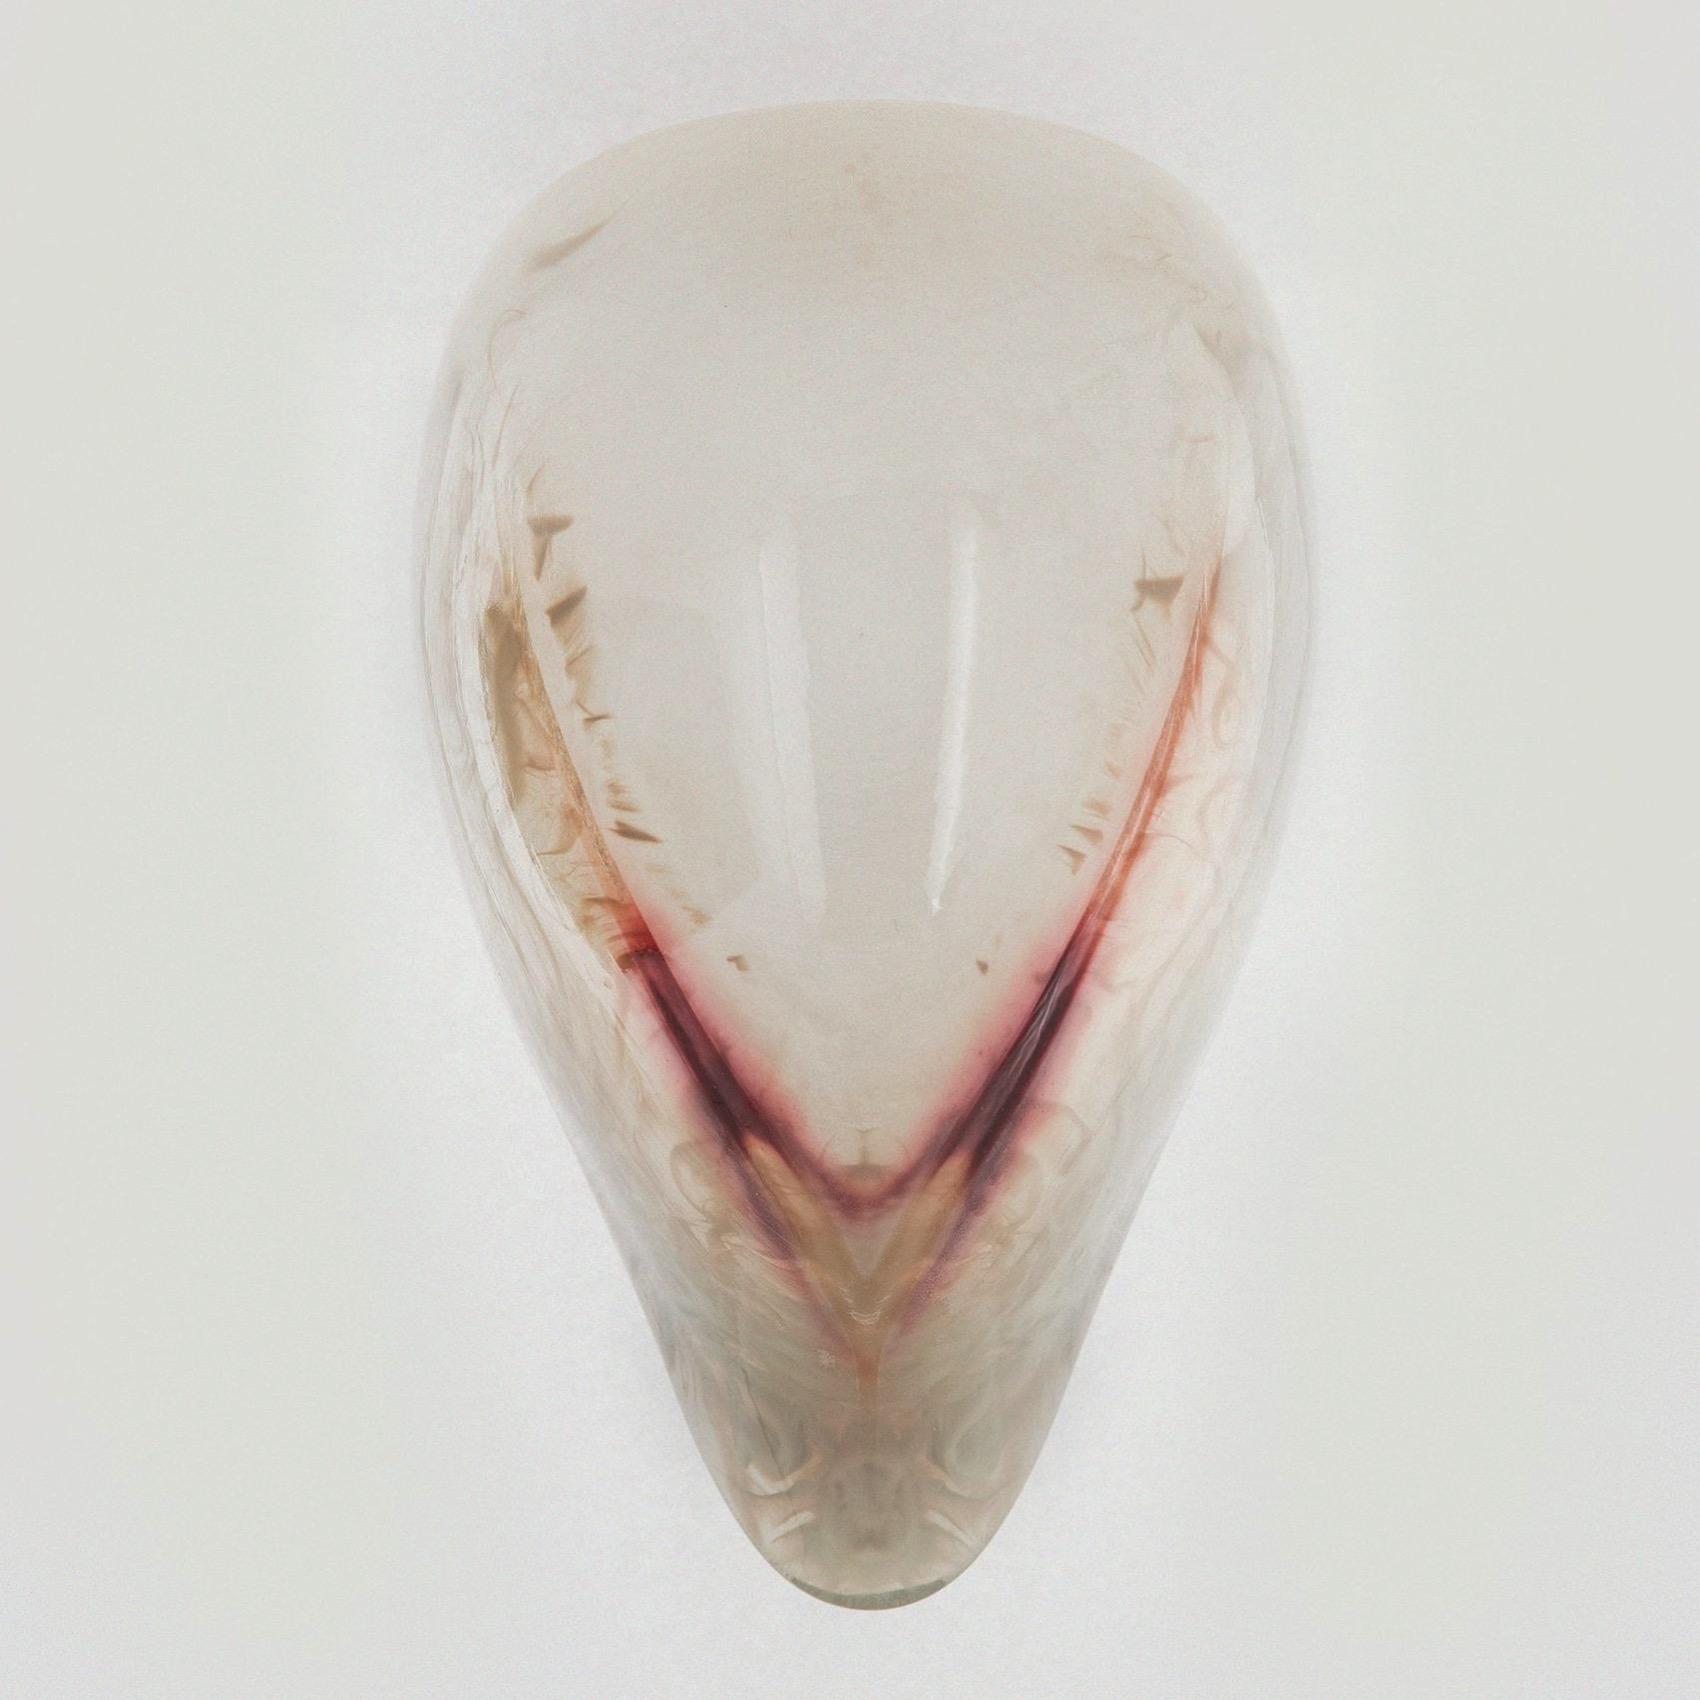 Neri oxman vespers death masks mit media lab dezeen 2364 col 0 1704x1704